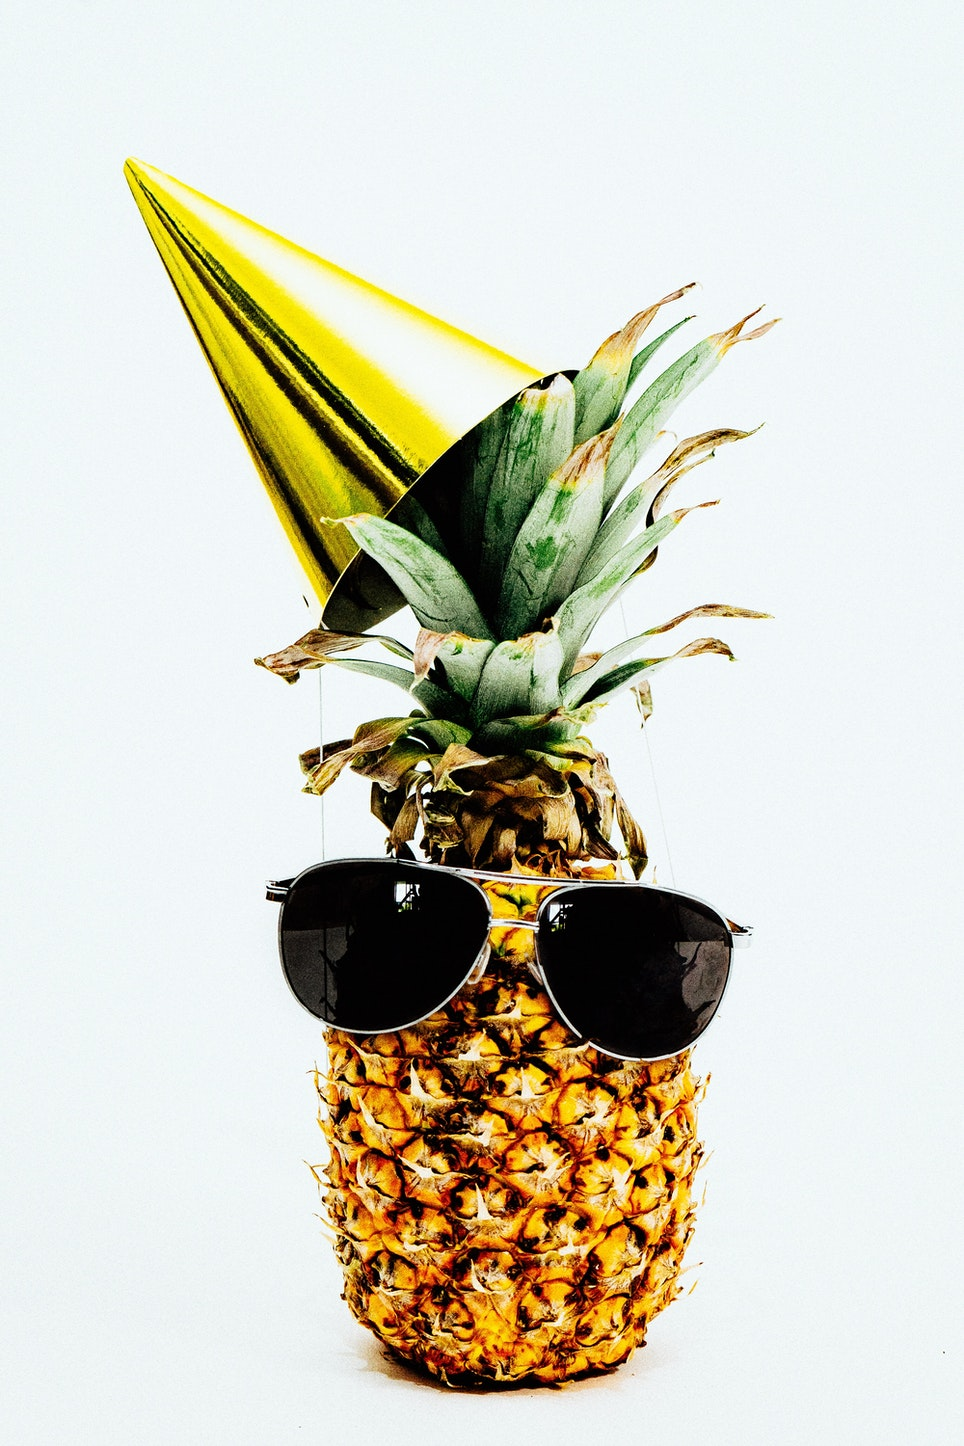 Pineapple supply co Ng Dapgp Ai TE unsplash